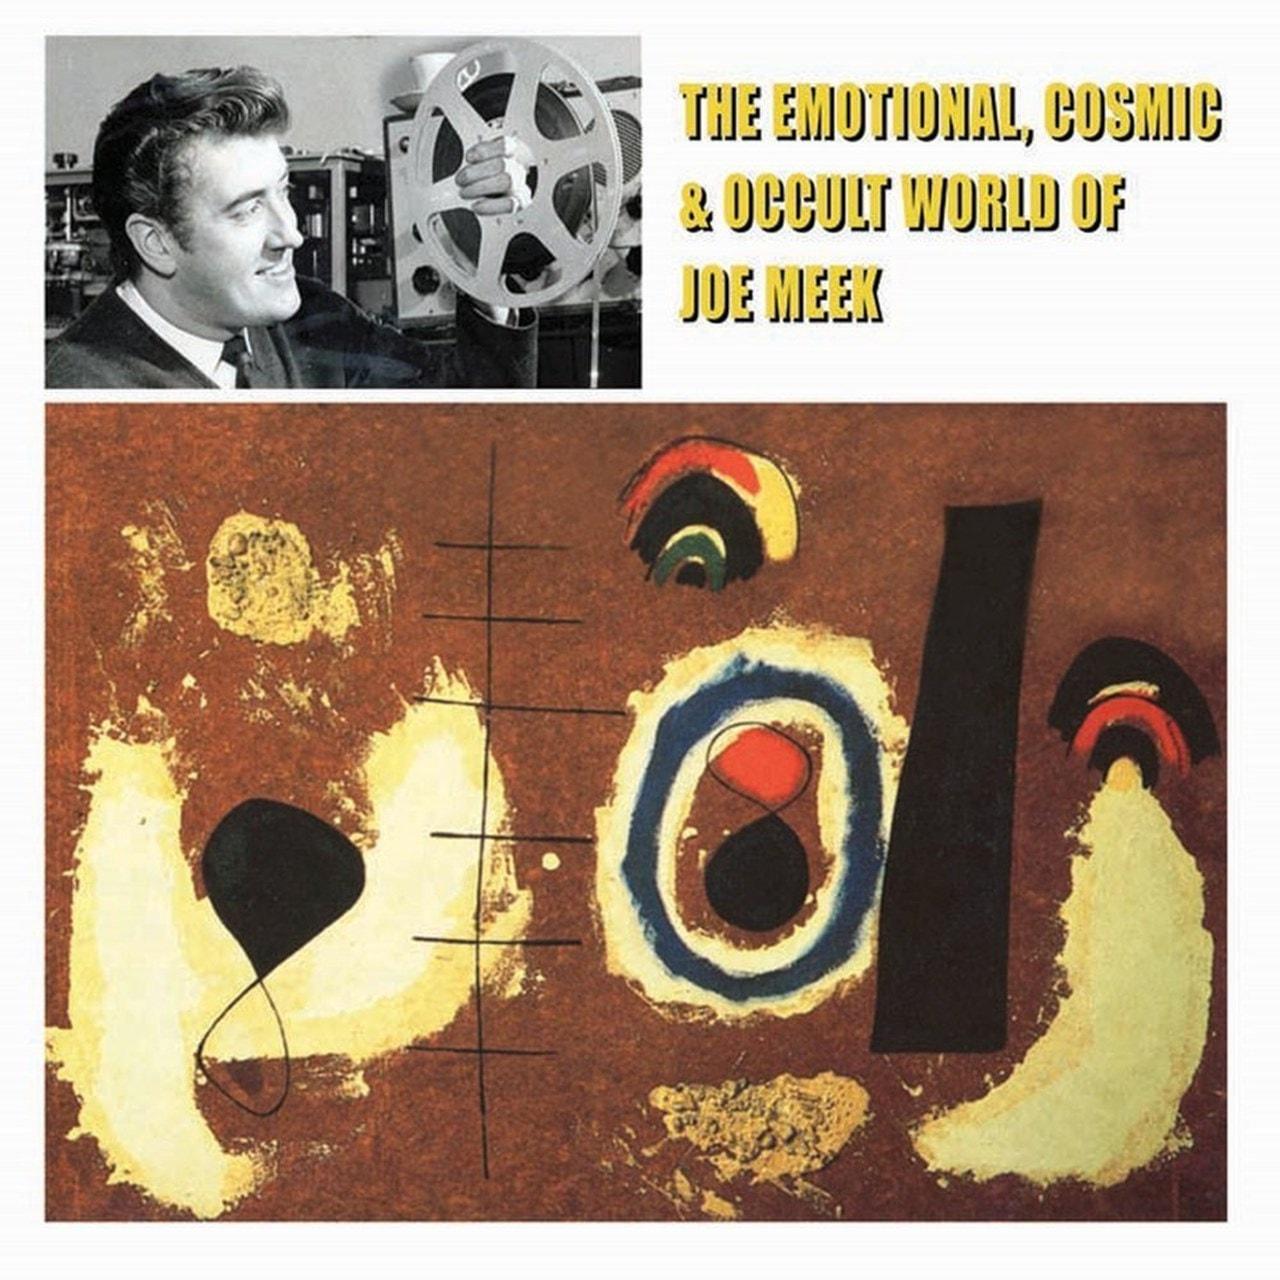 The Emotional, Cosmic & Occult World of Joe Meek - 1